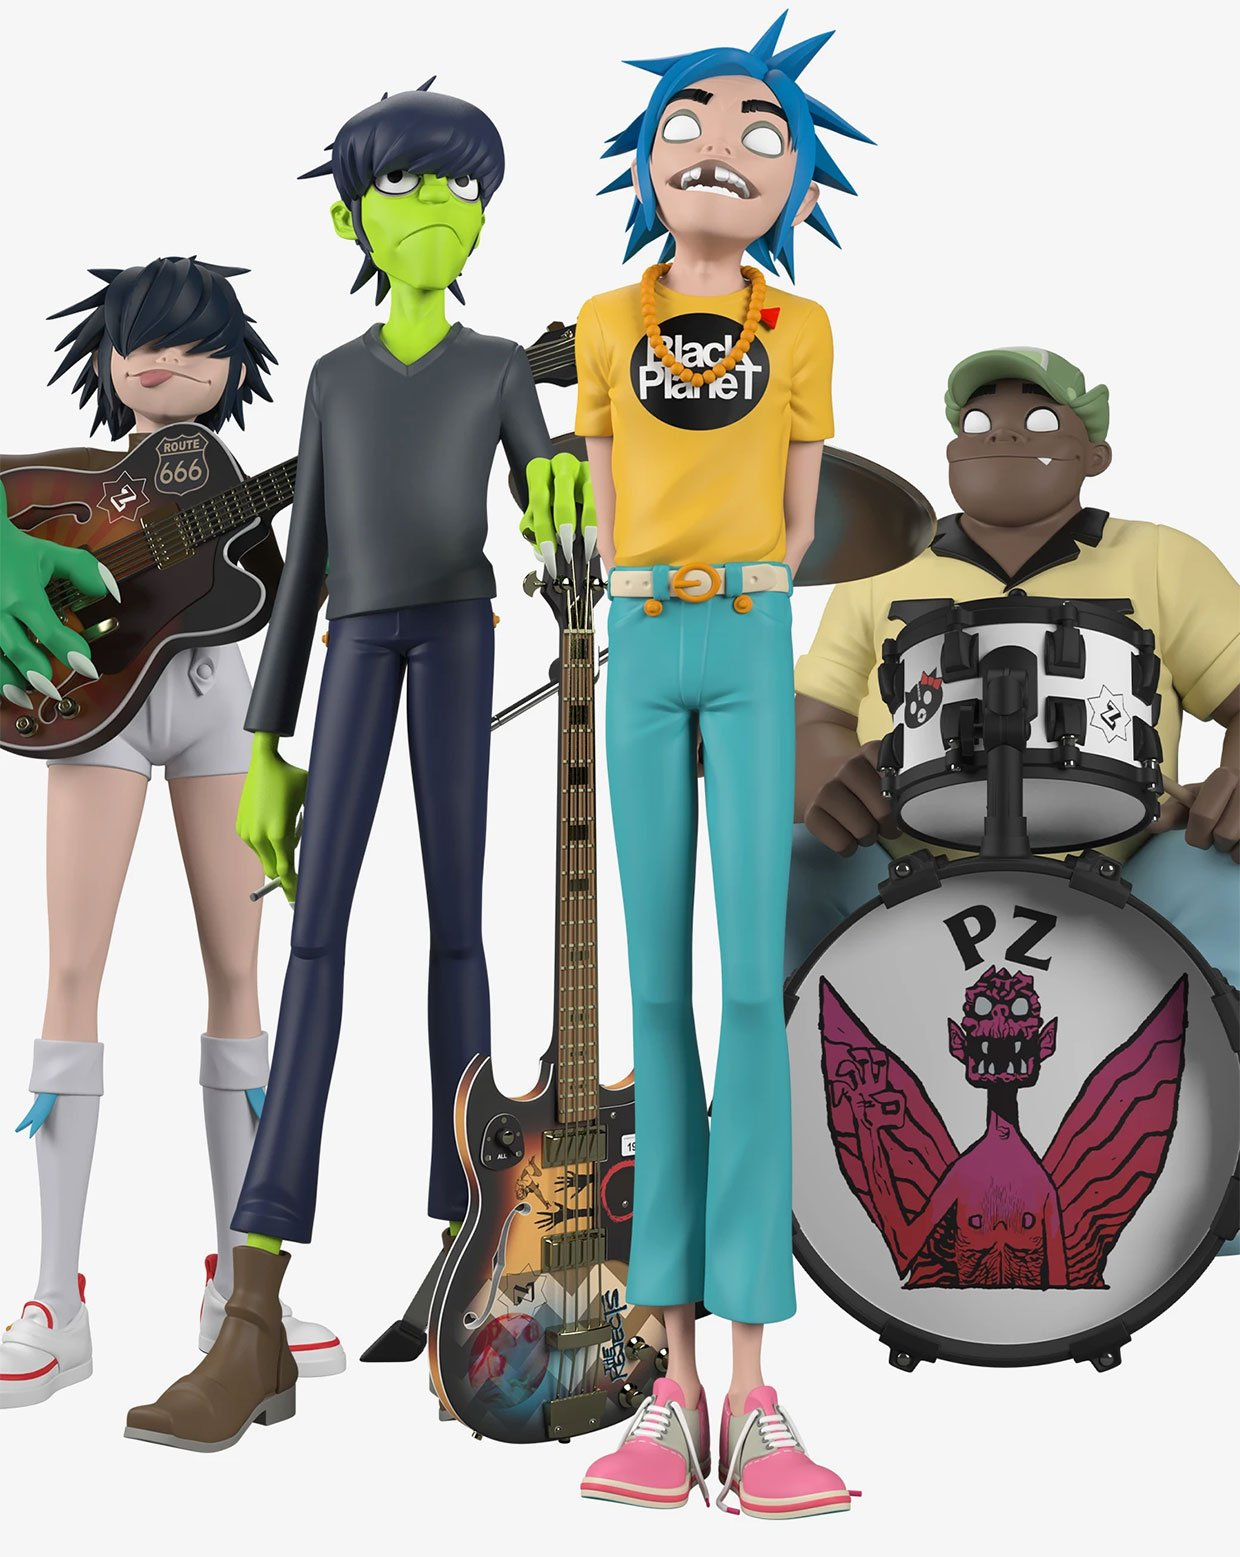 Superplastic x Gorillaz Song Machine Band Vinyl Figures